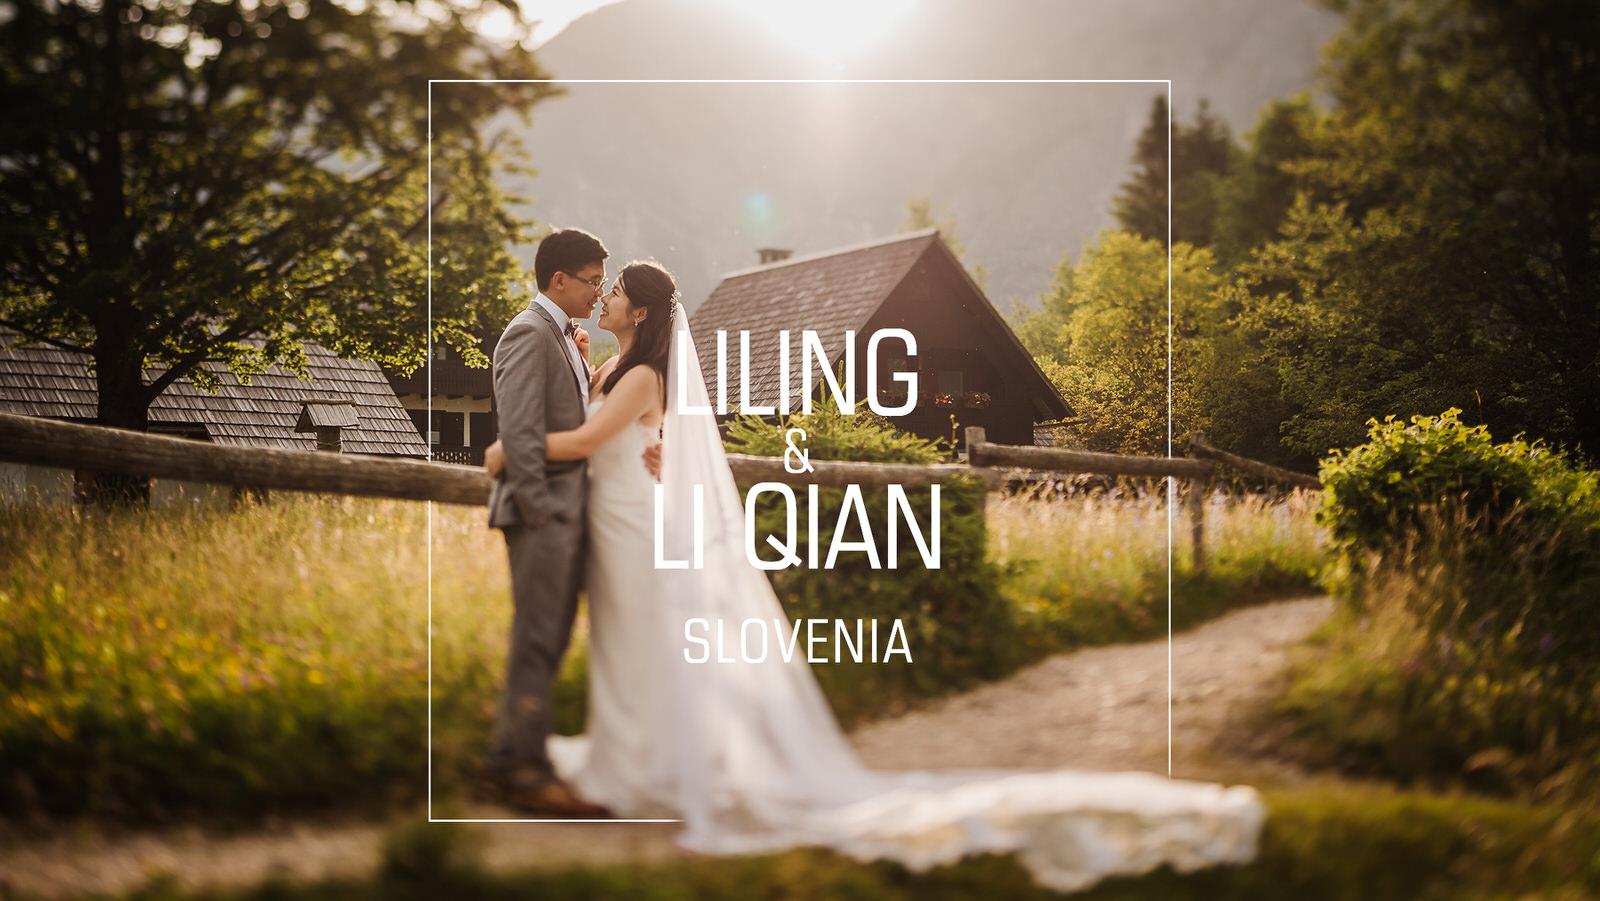 Liling and Li Qian.jpg